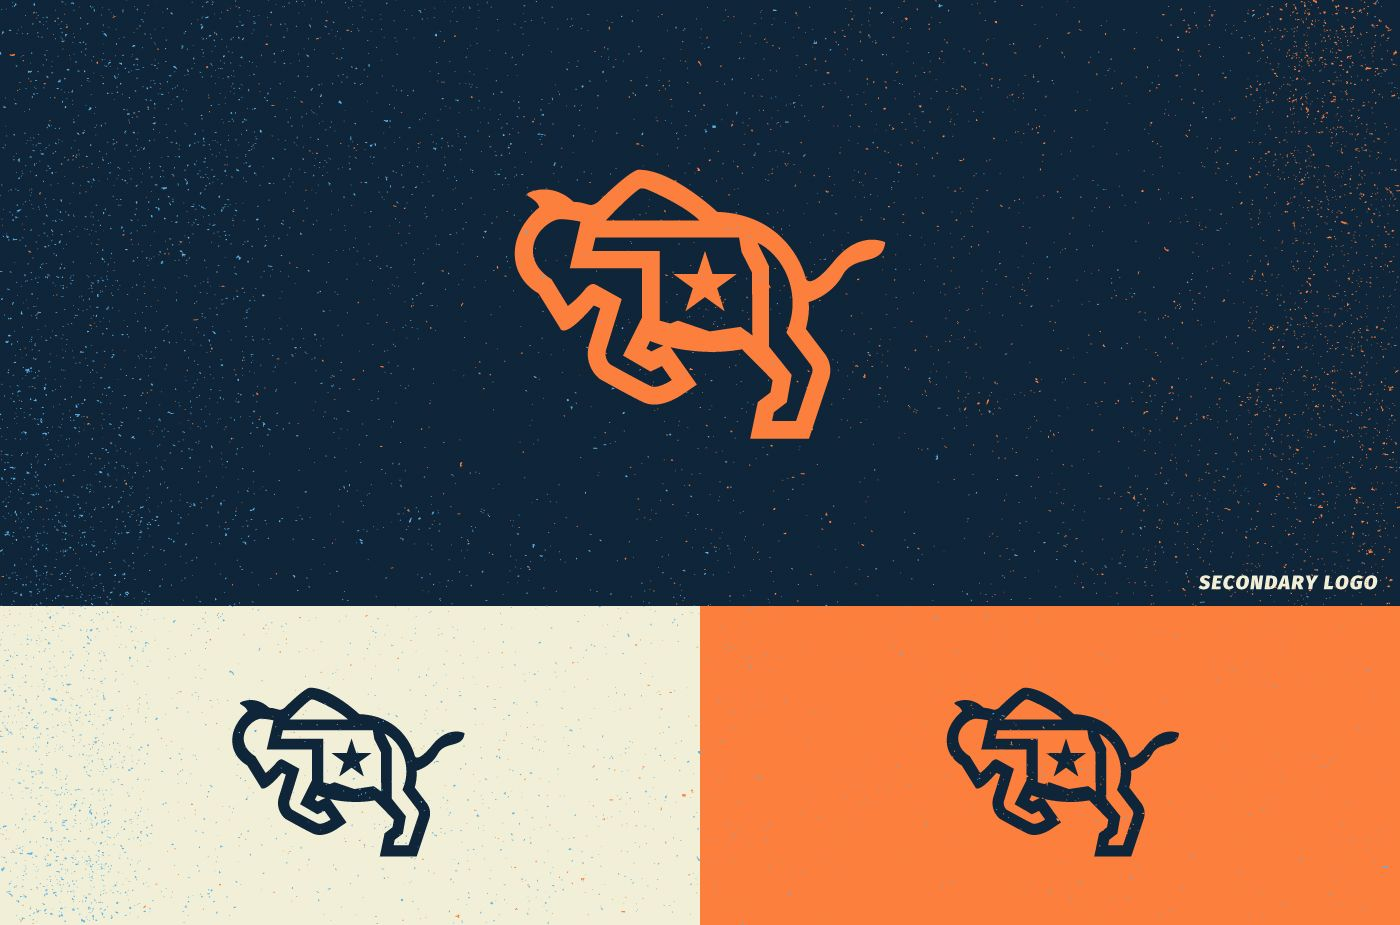 Concept for a new Oklahoma City Thunder brand identity.